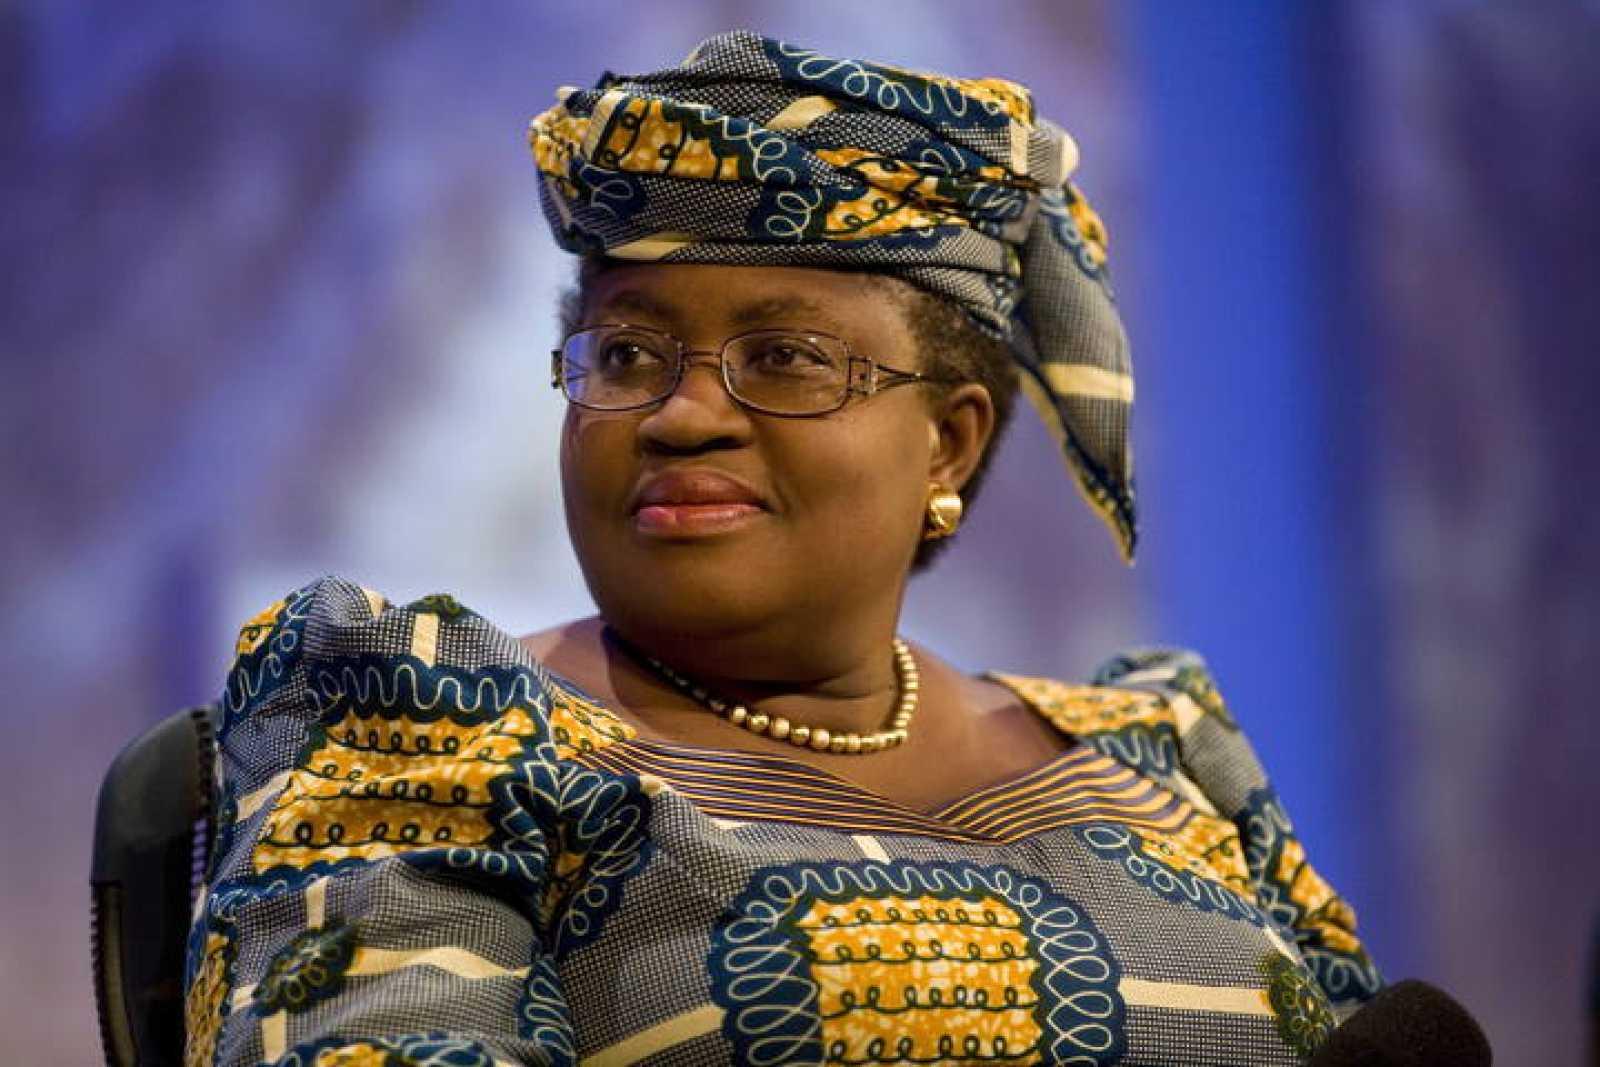 Ngozi Okonjo-Iweala, candidata a presidir el Banco Mundial marzo 2012